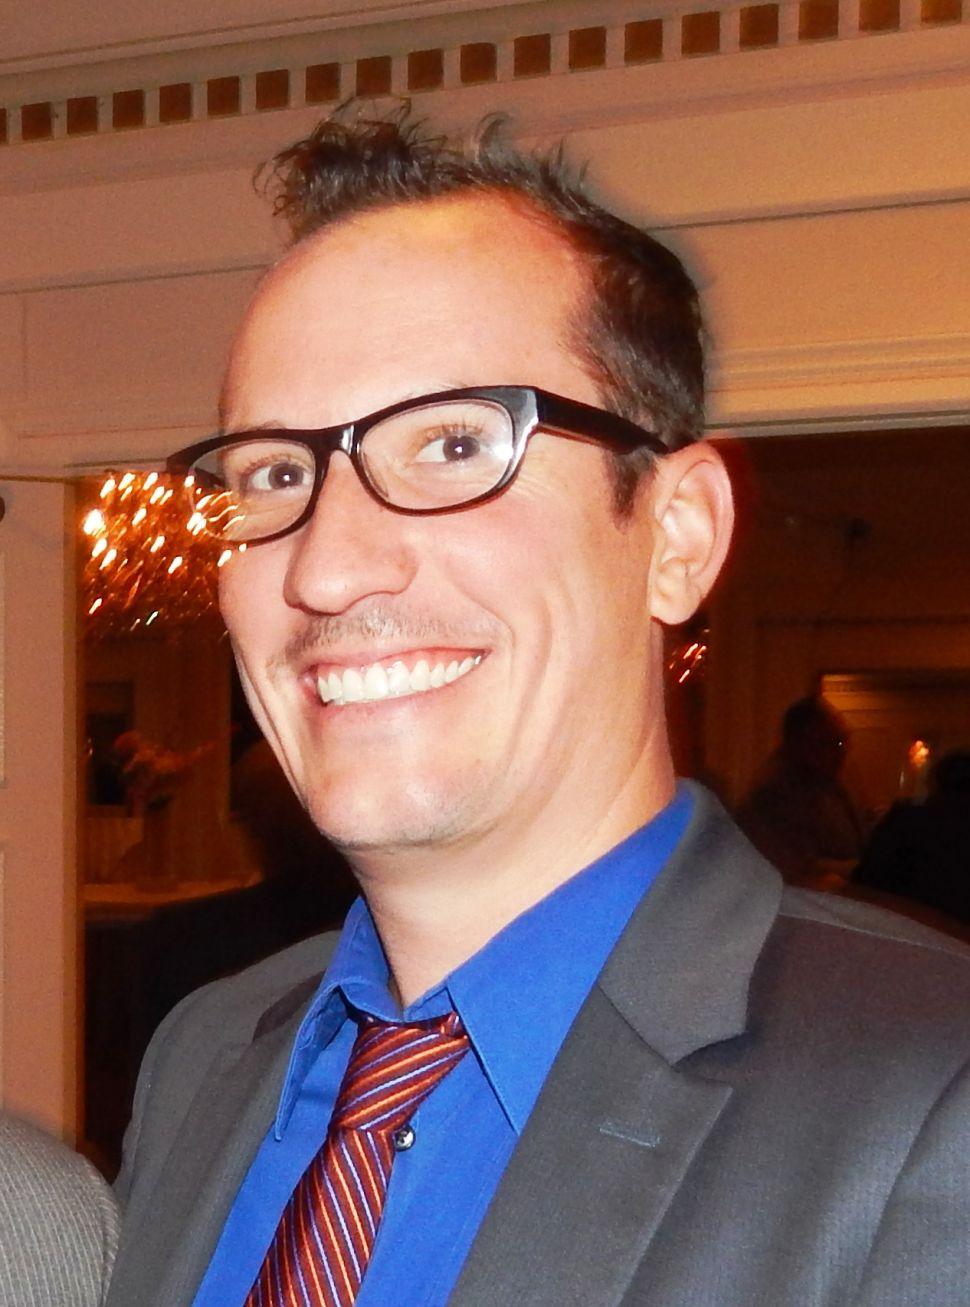 Hillmann slams anti-gay 'Brooker' mailer